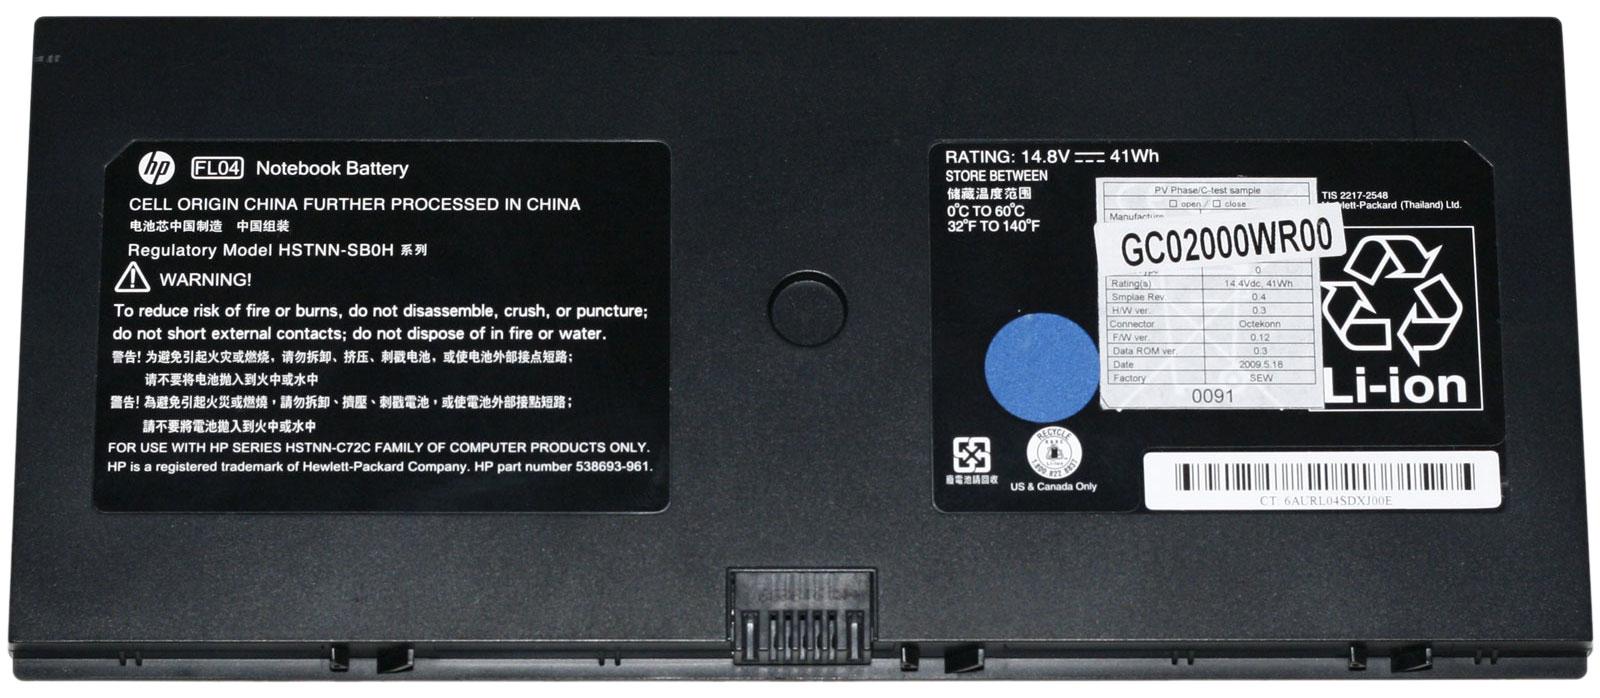 Hp Probook 5310m Battery Life Hp Probook 5310m A